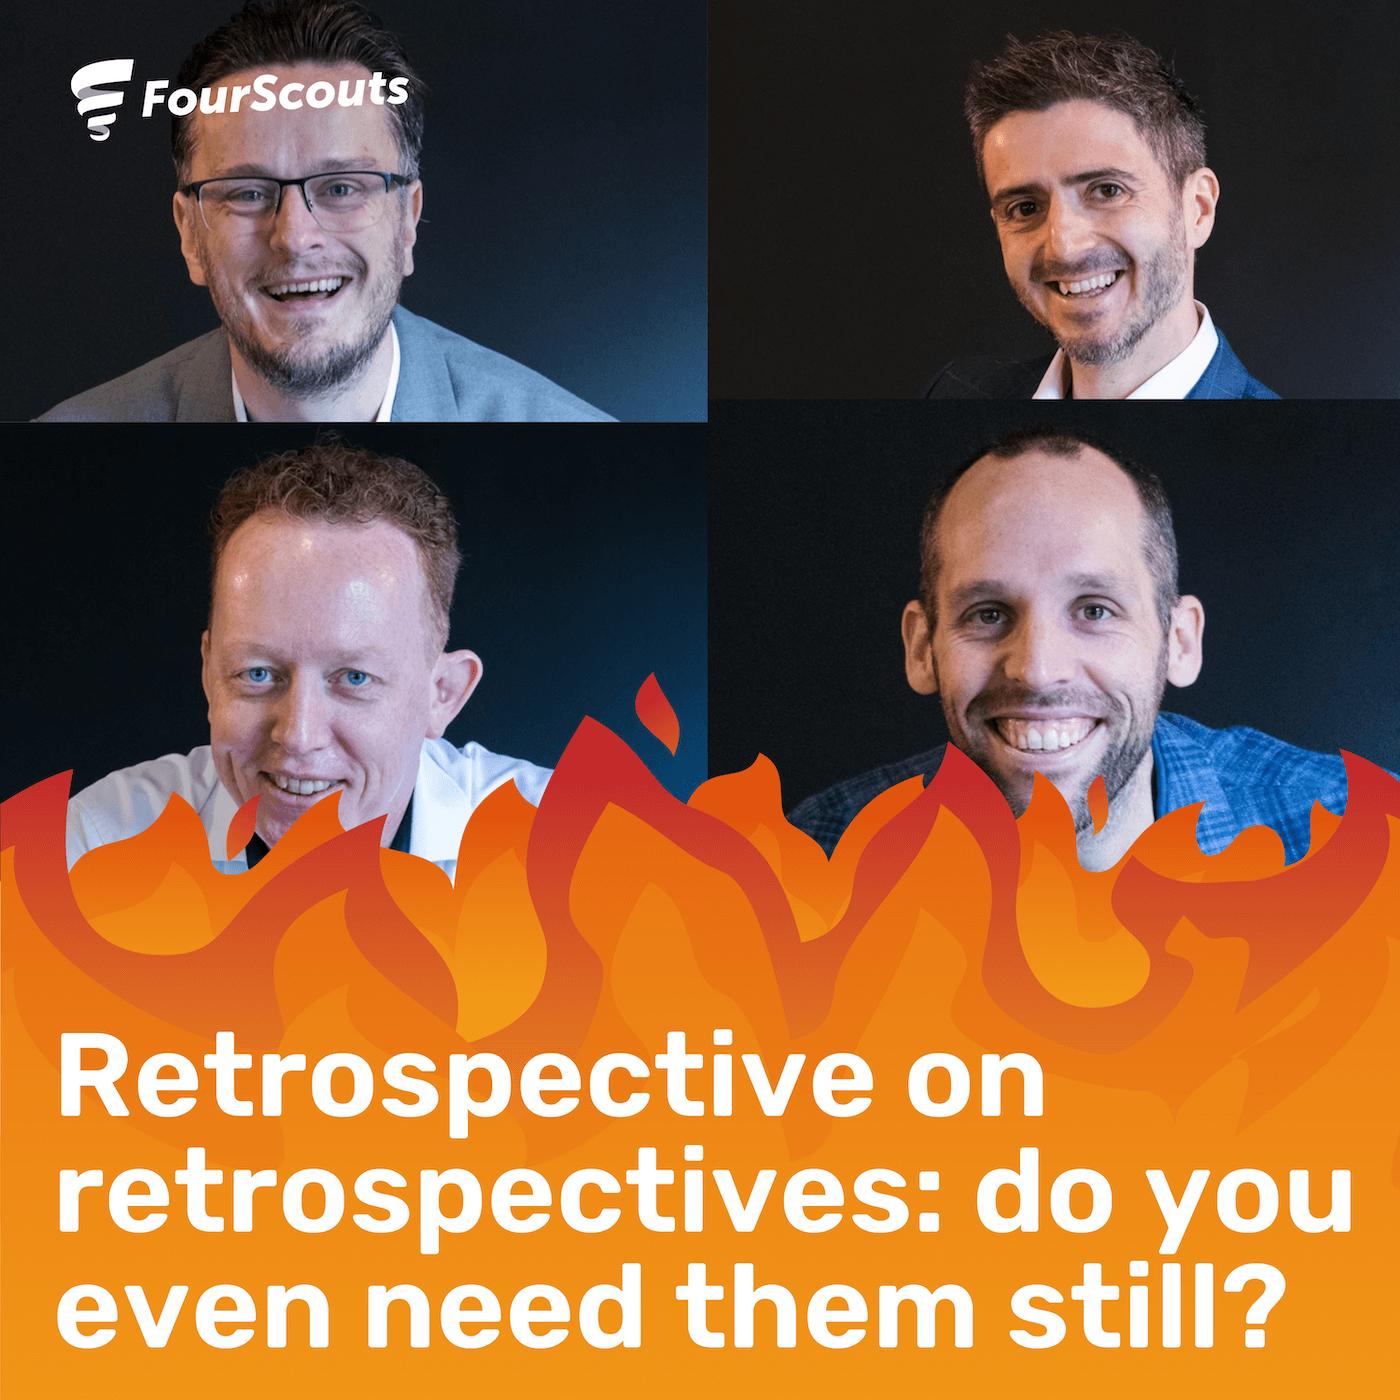 Retrospective on retrospectives: do you even need retros?